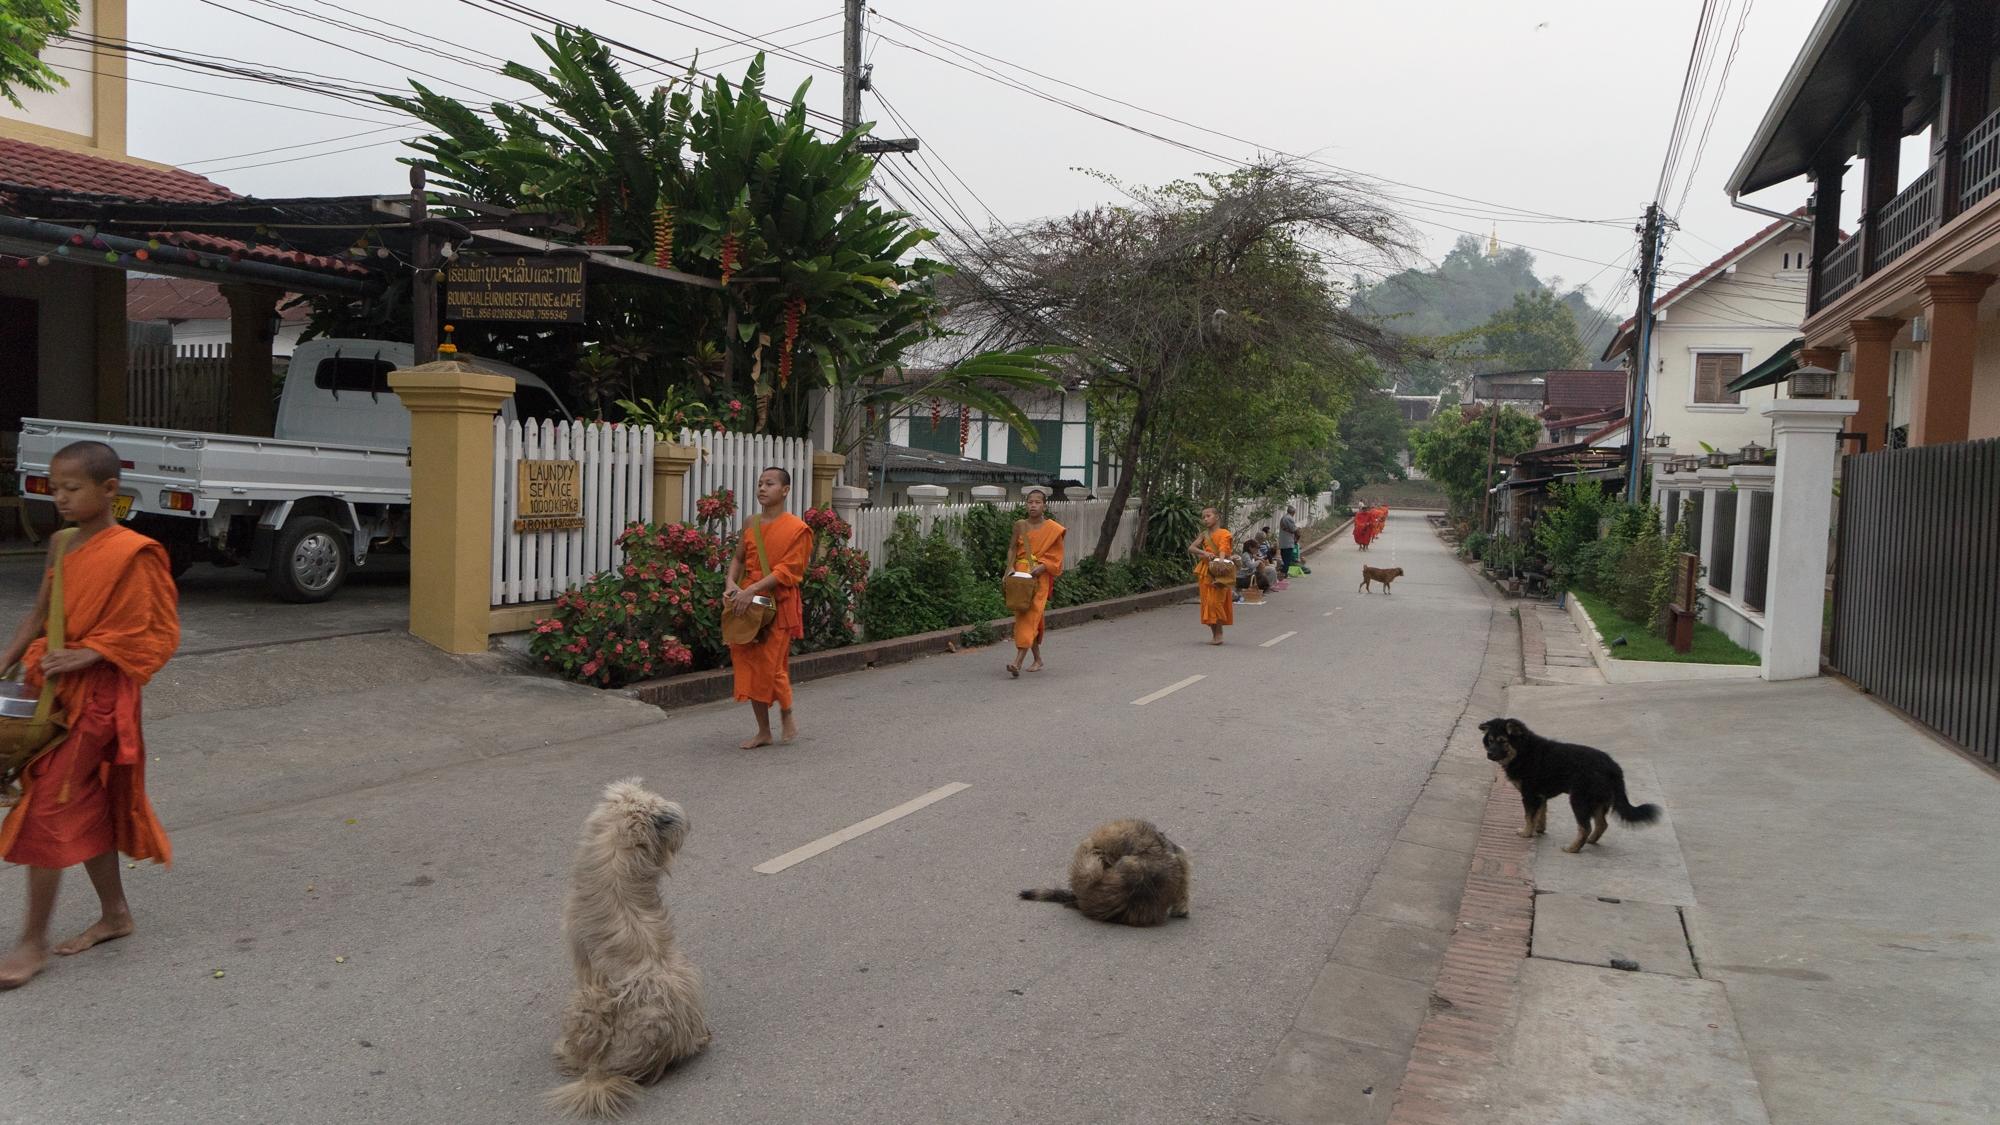 Daytripper365 Laos (27 of 39).jpg